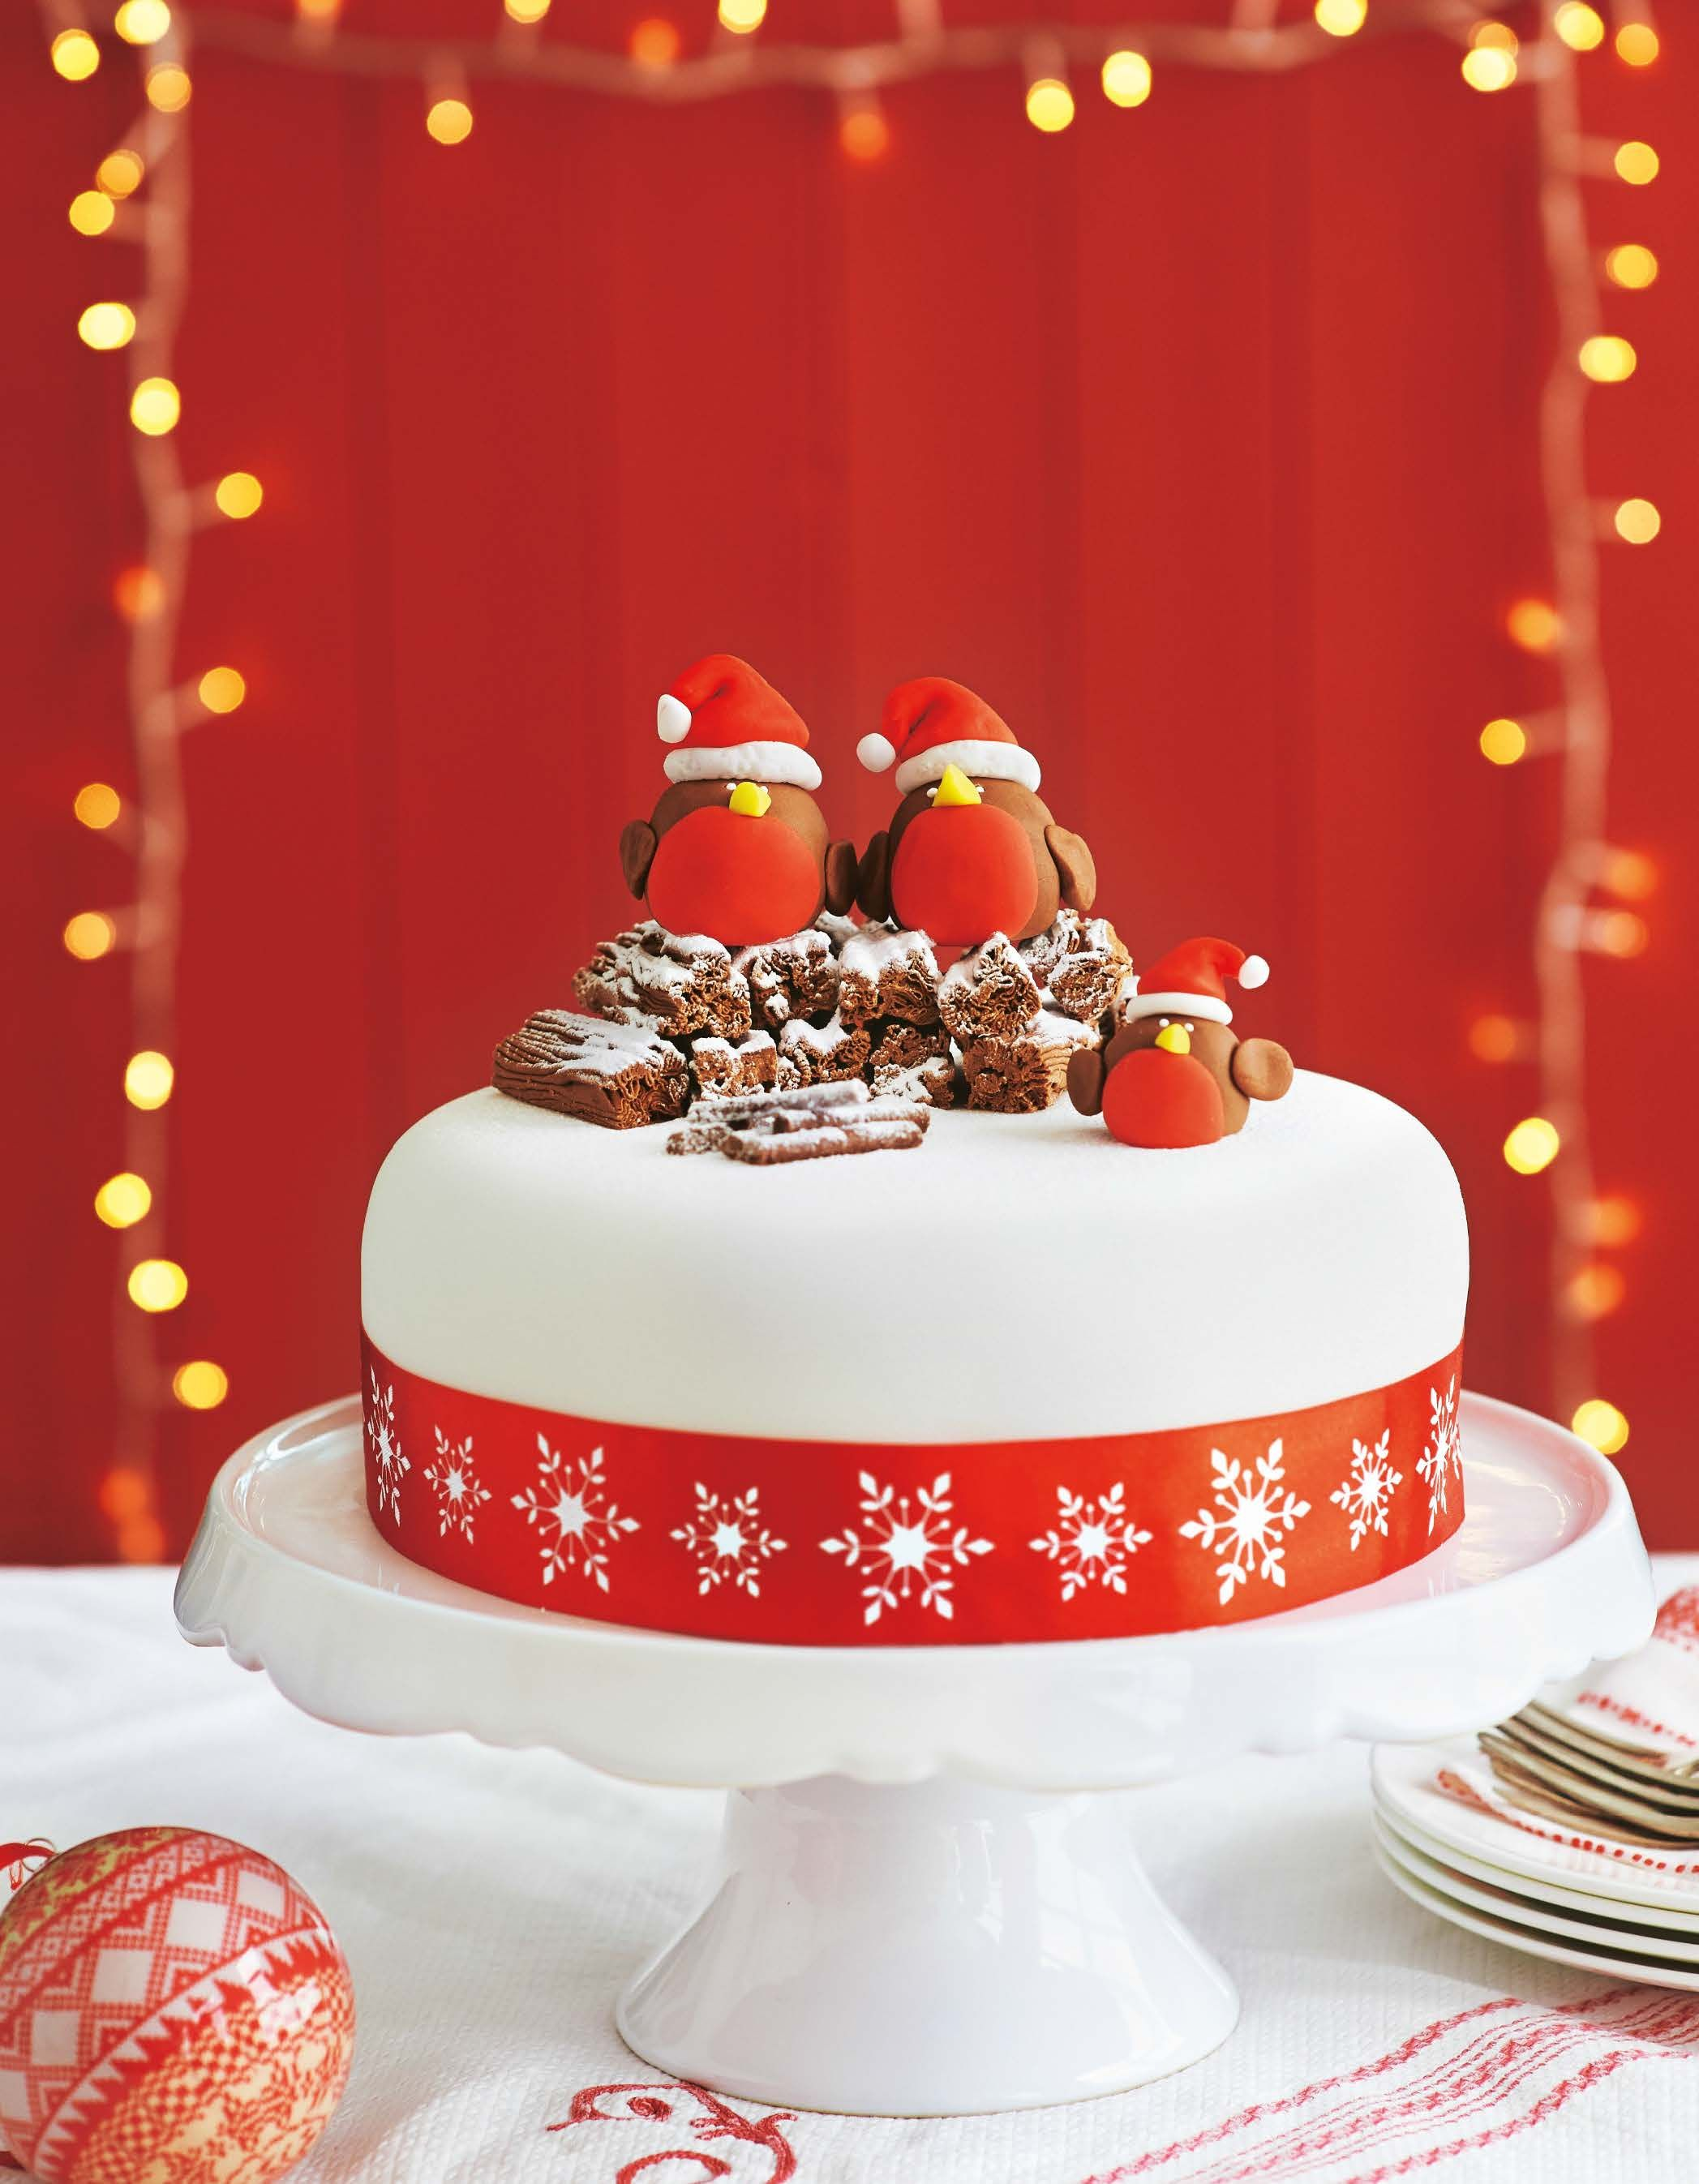 Asda Magazine December 2013 Christmas Pinterest Robins Cake